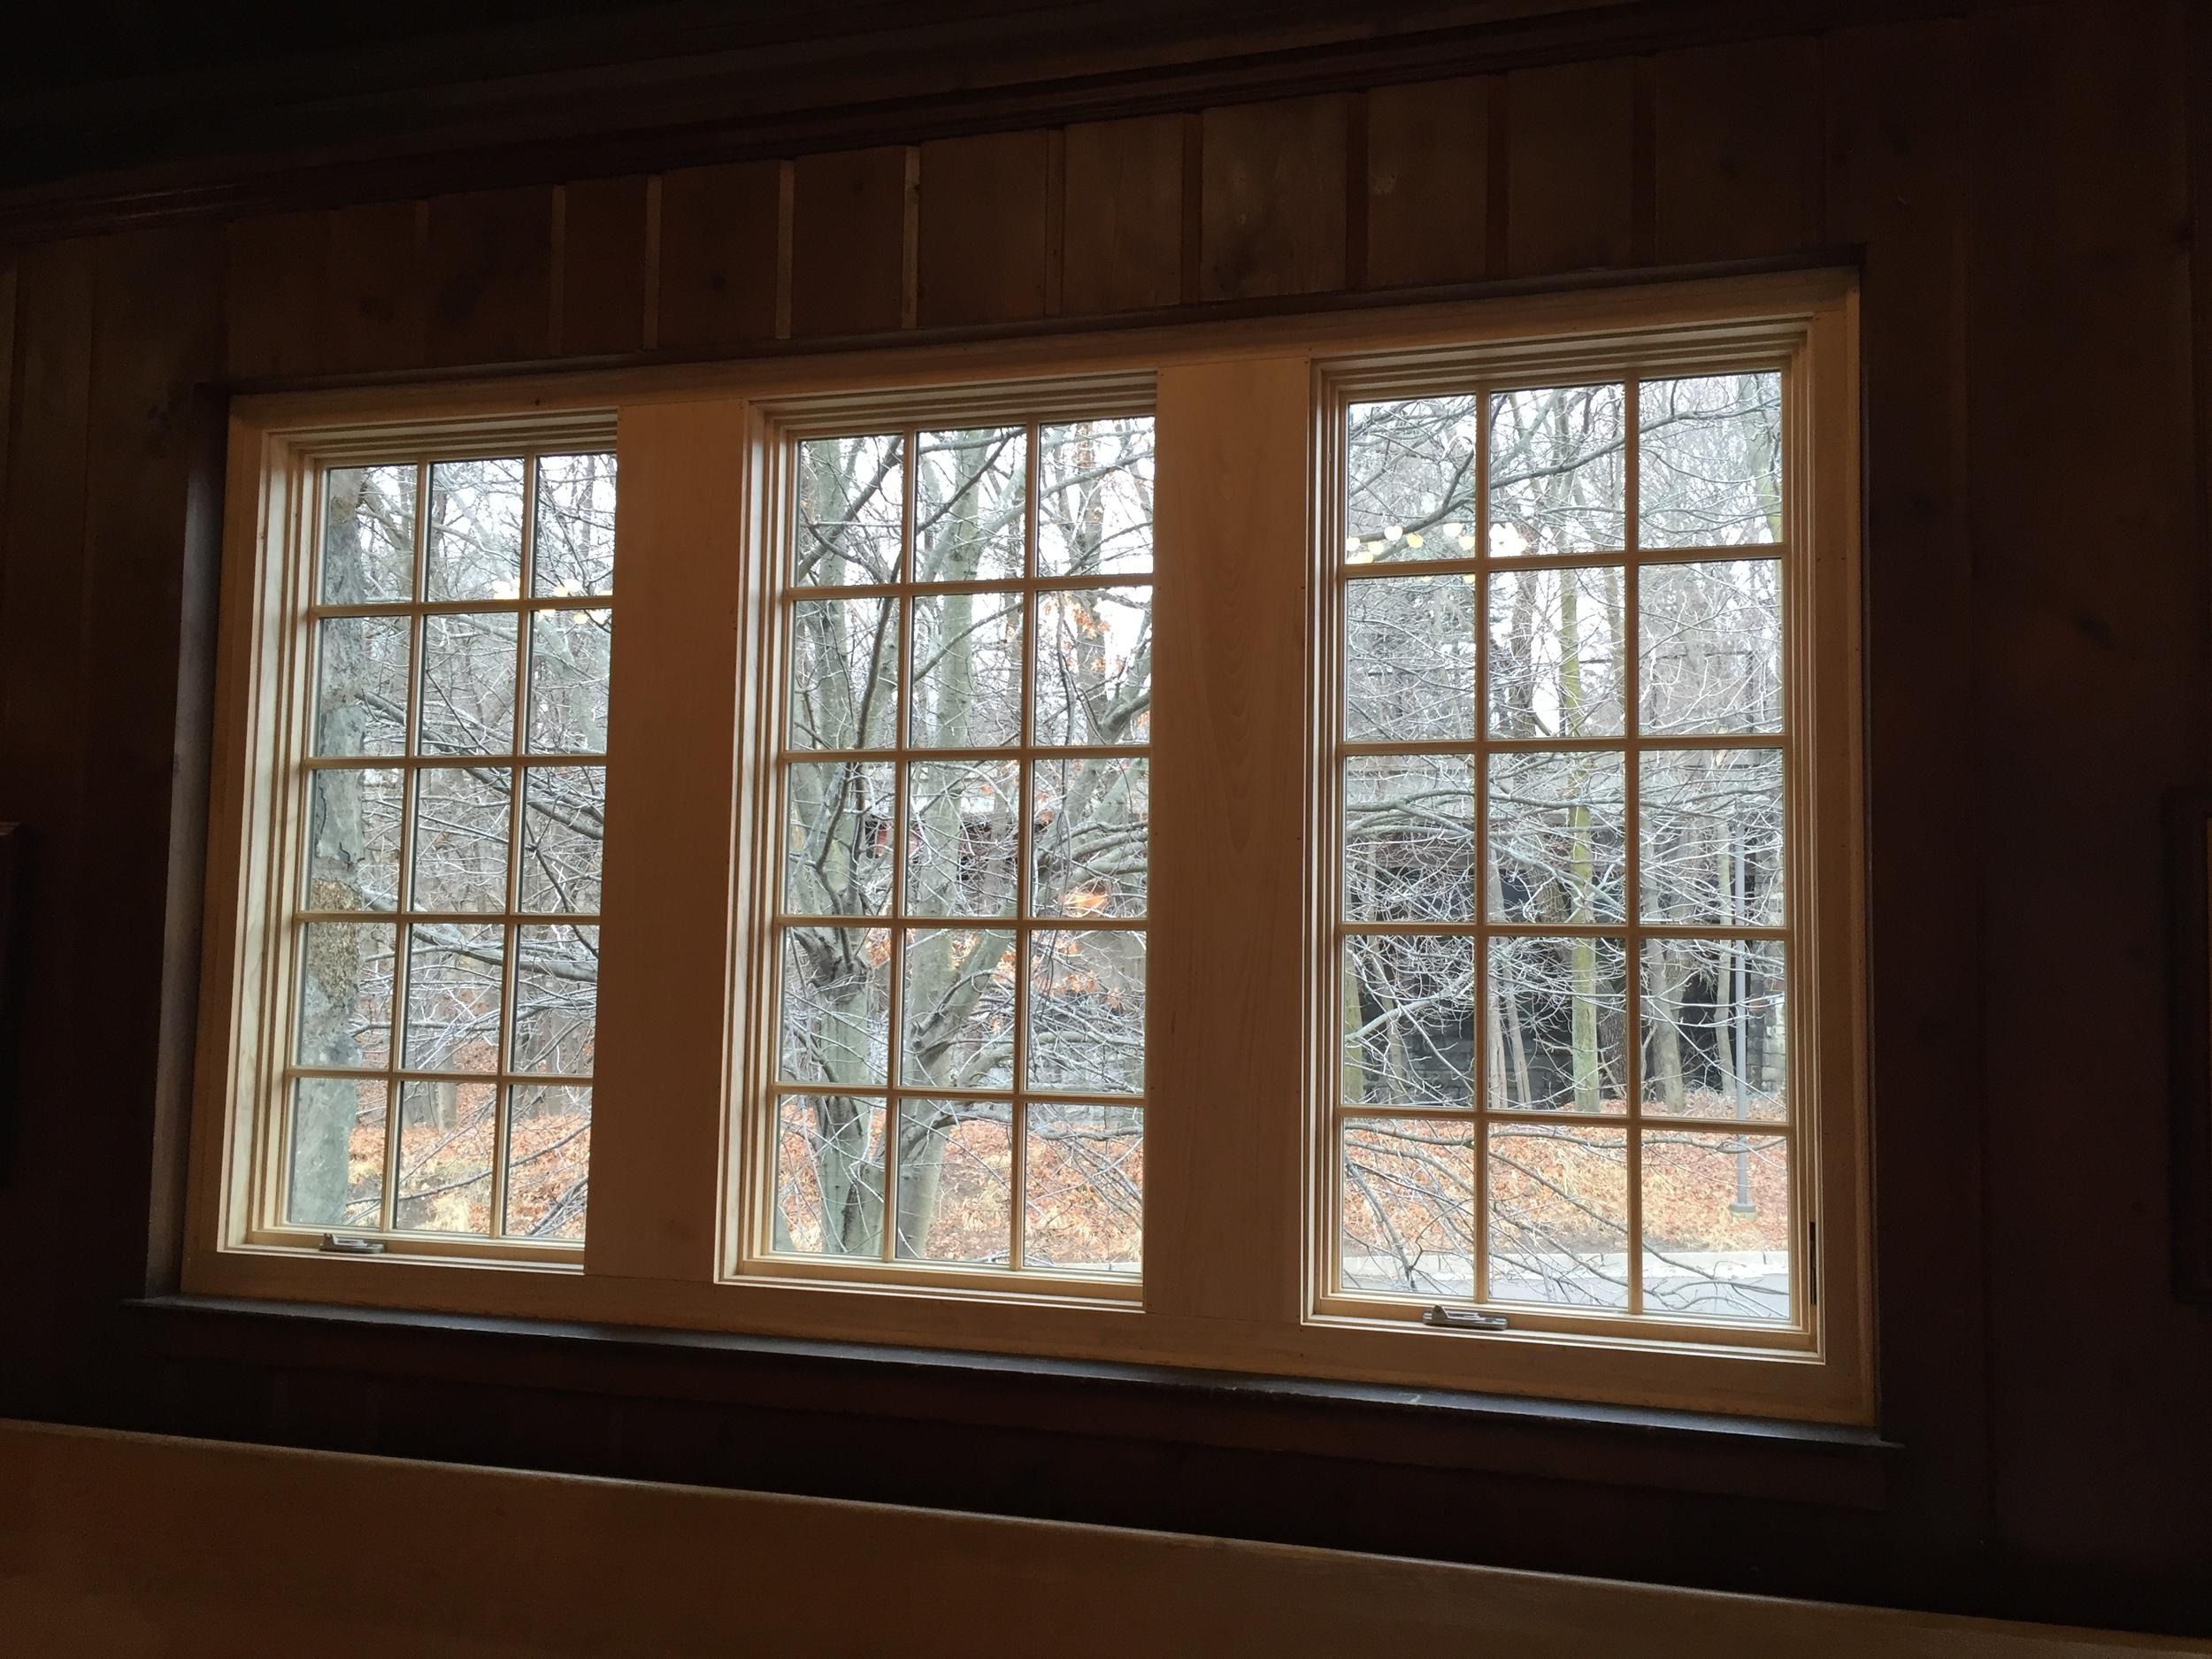 parish hall inside windows.JPG